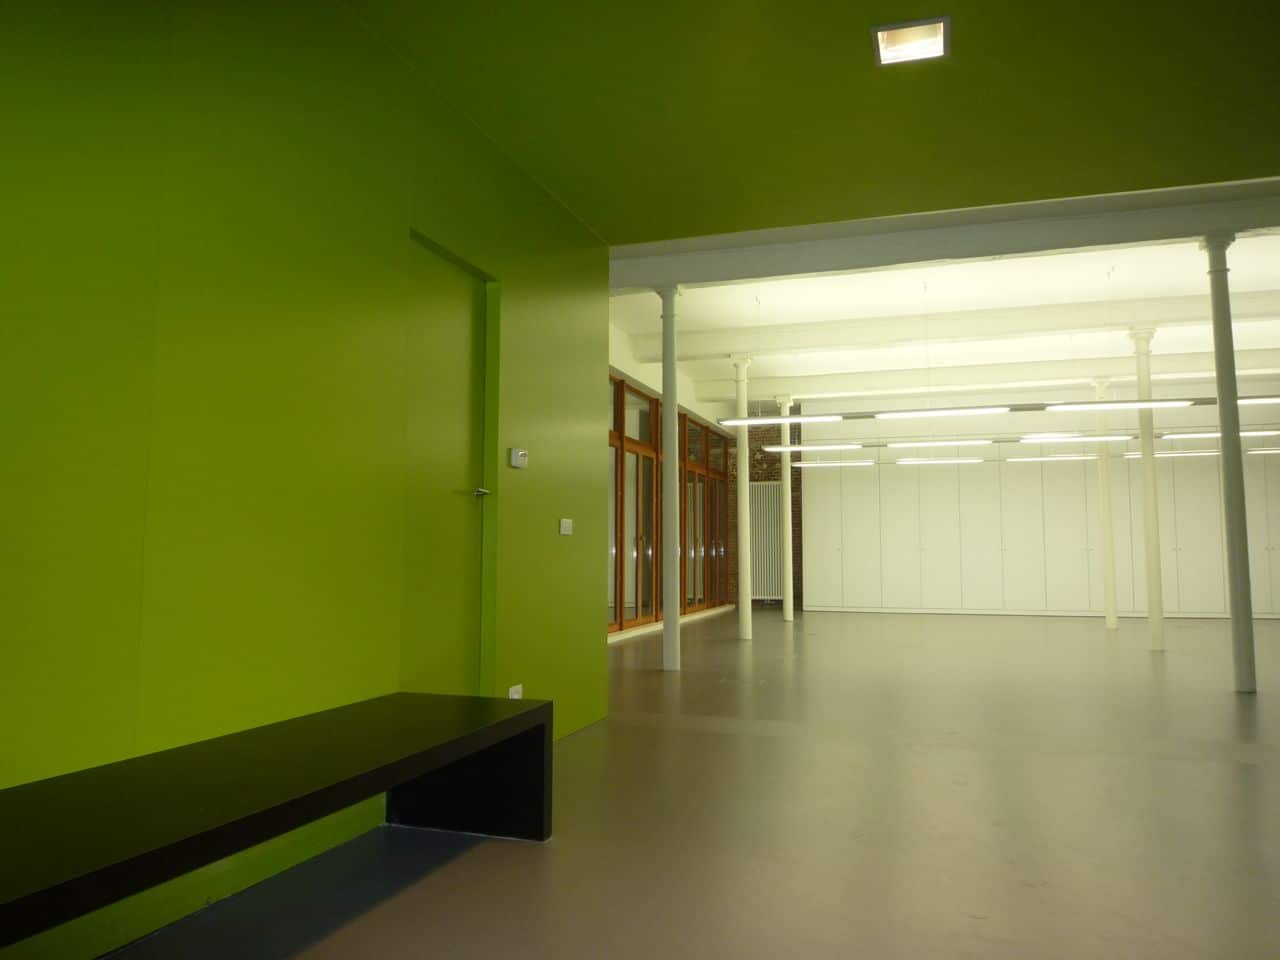 P1060777 | Baeyens & Beck architecten Gent | architect nieuwbouw renovatie interieur | high end | architectenbureau